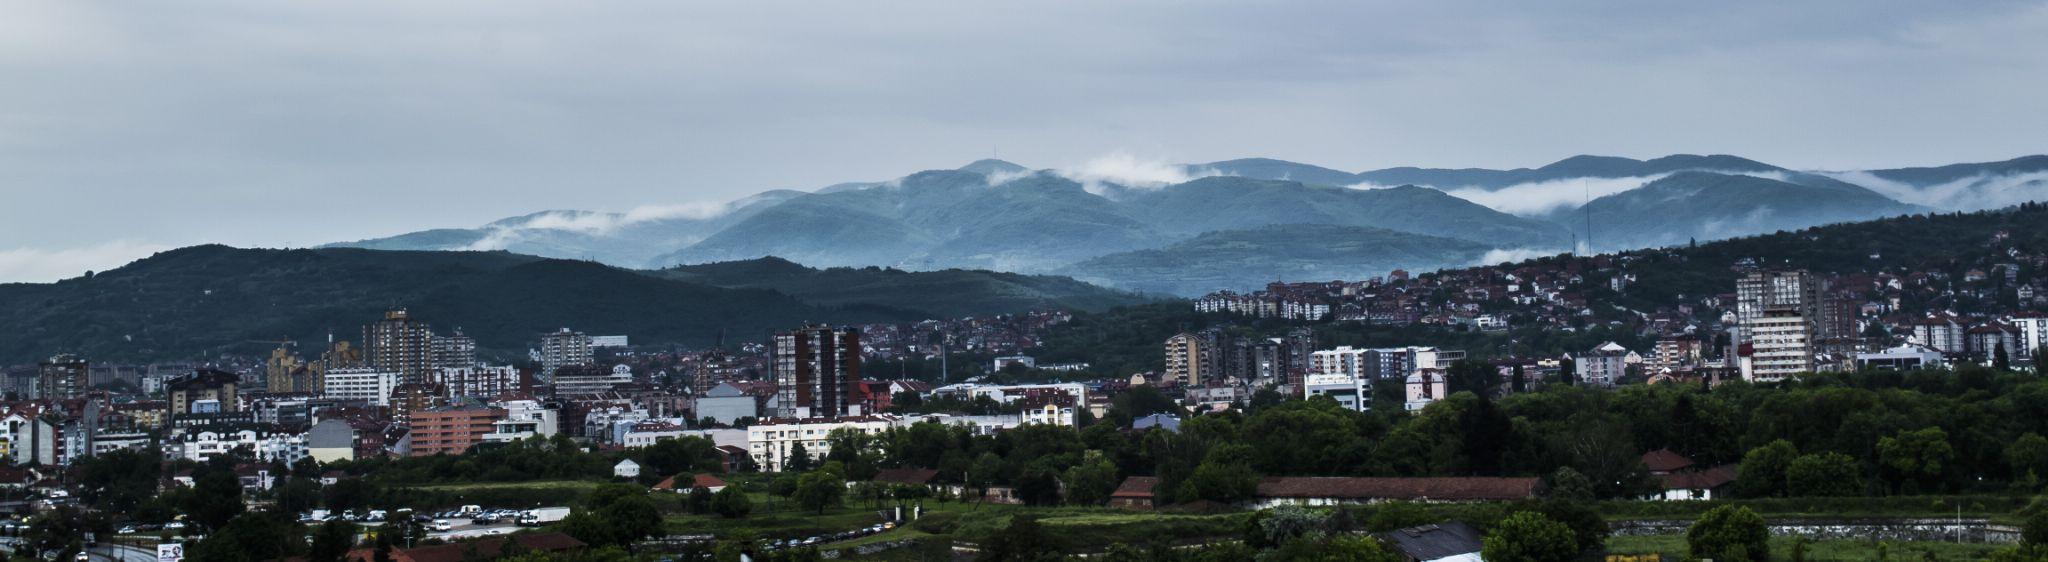 Planine u magli by Leonhard Radonic